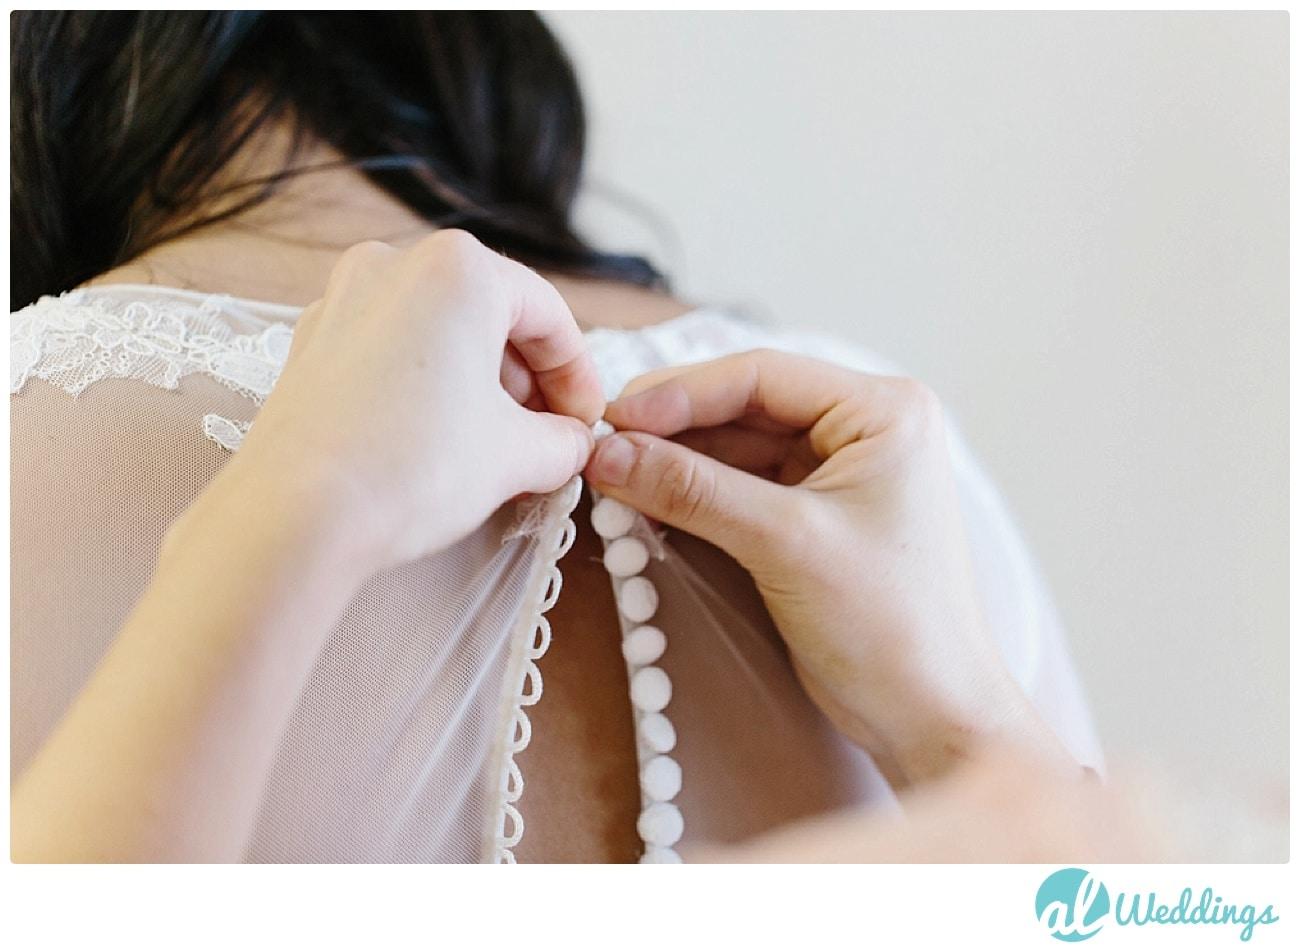 Austin Wedding | Hidden Meadows Vineyard | Alabama Wedding Photographer-28.jpg